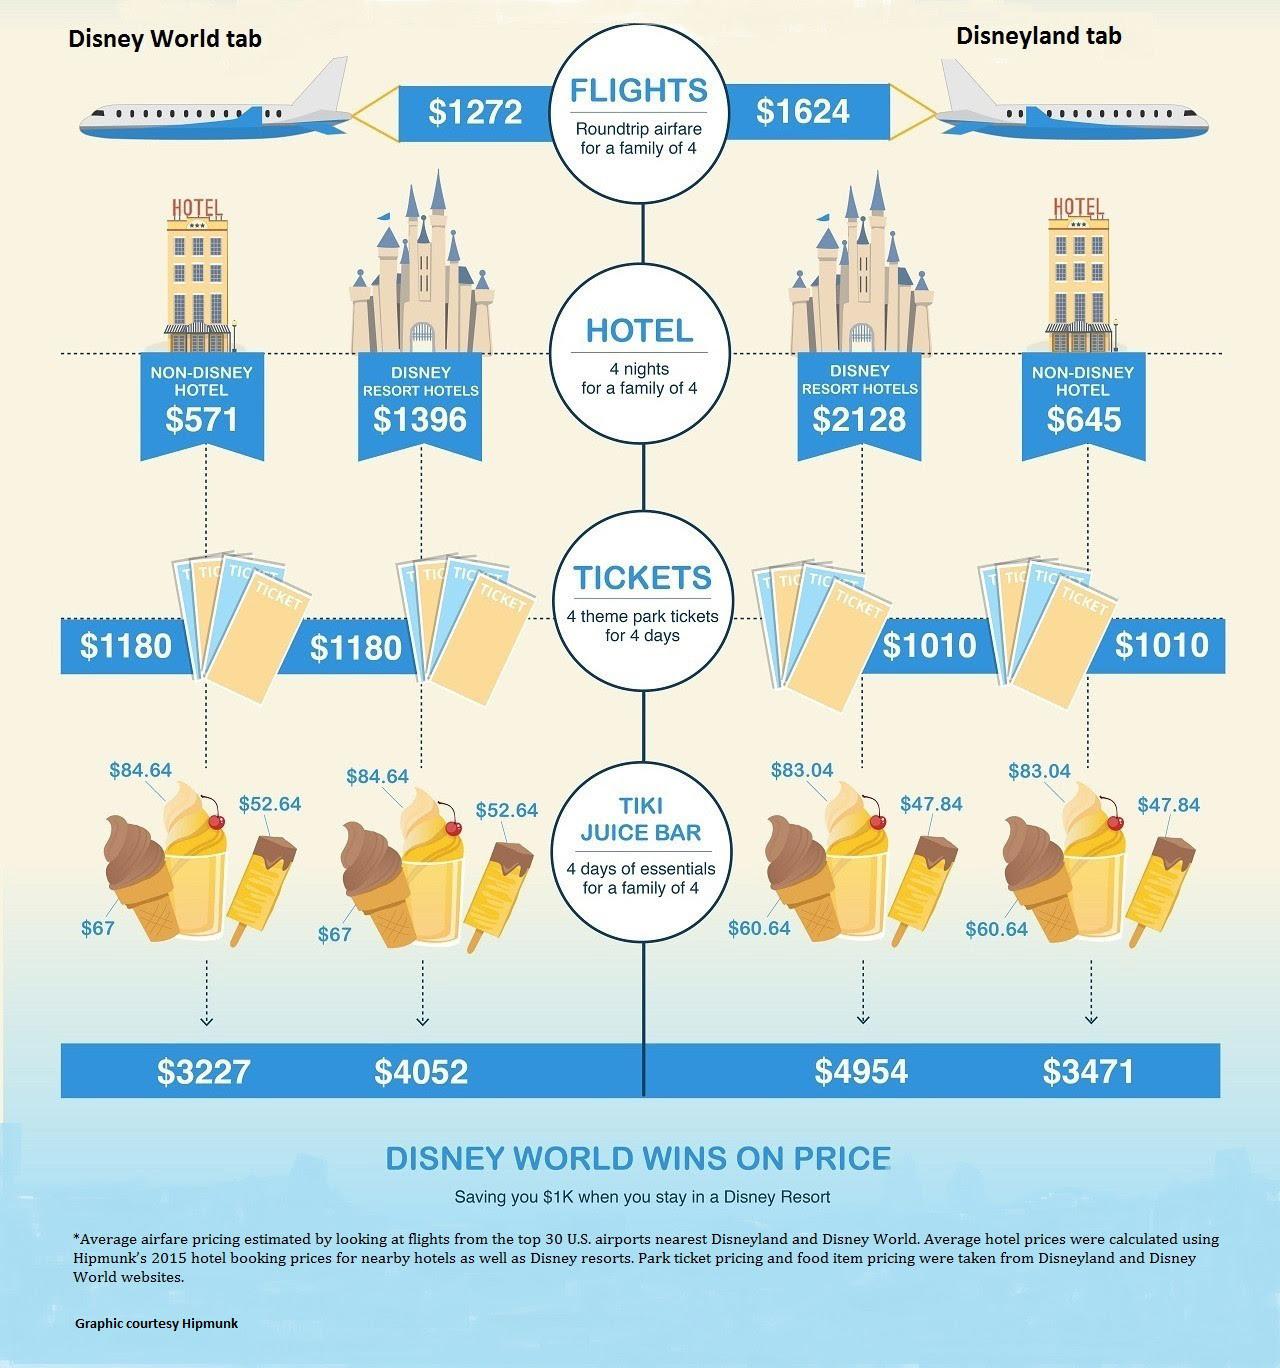 Is Disney World or Disneyland more affordable